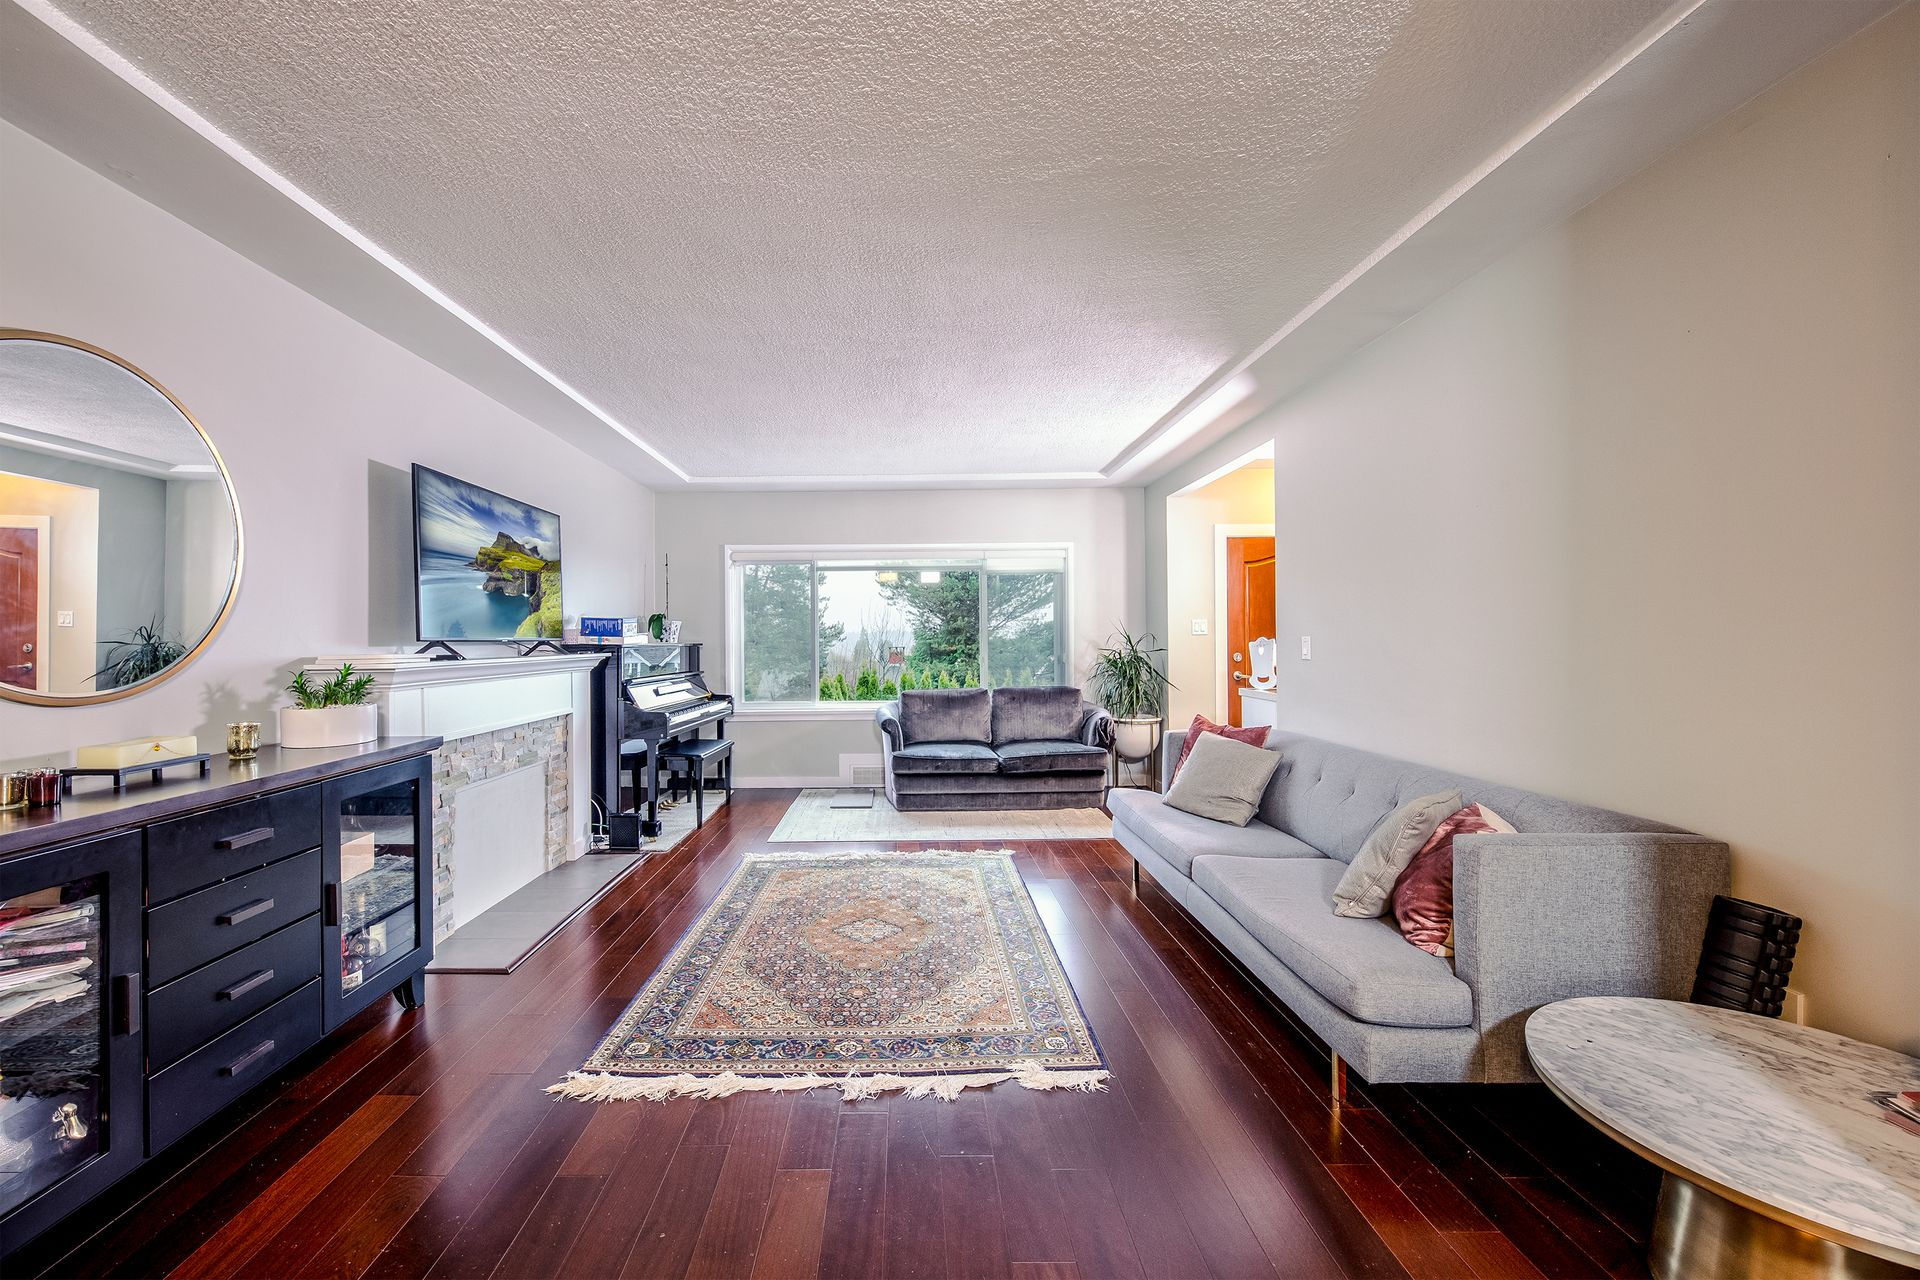 interior_002 at 1145 Lawson Avenue, Ambleside, West Vancouver